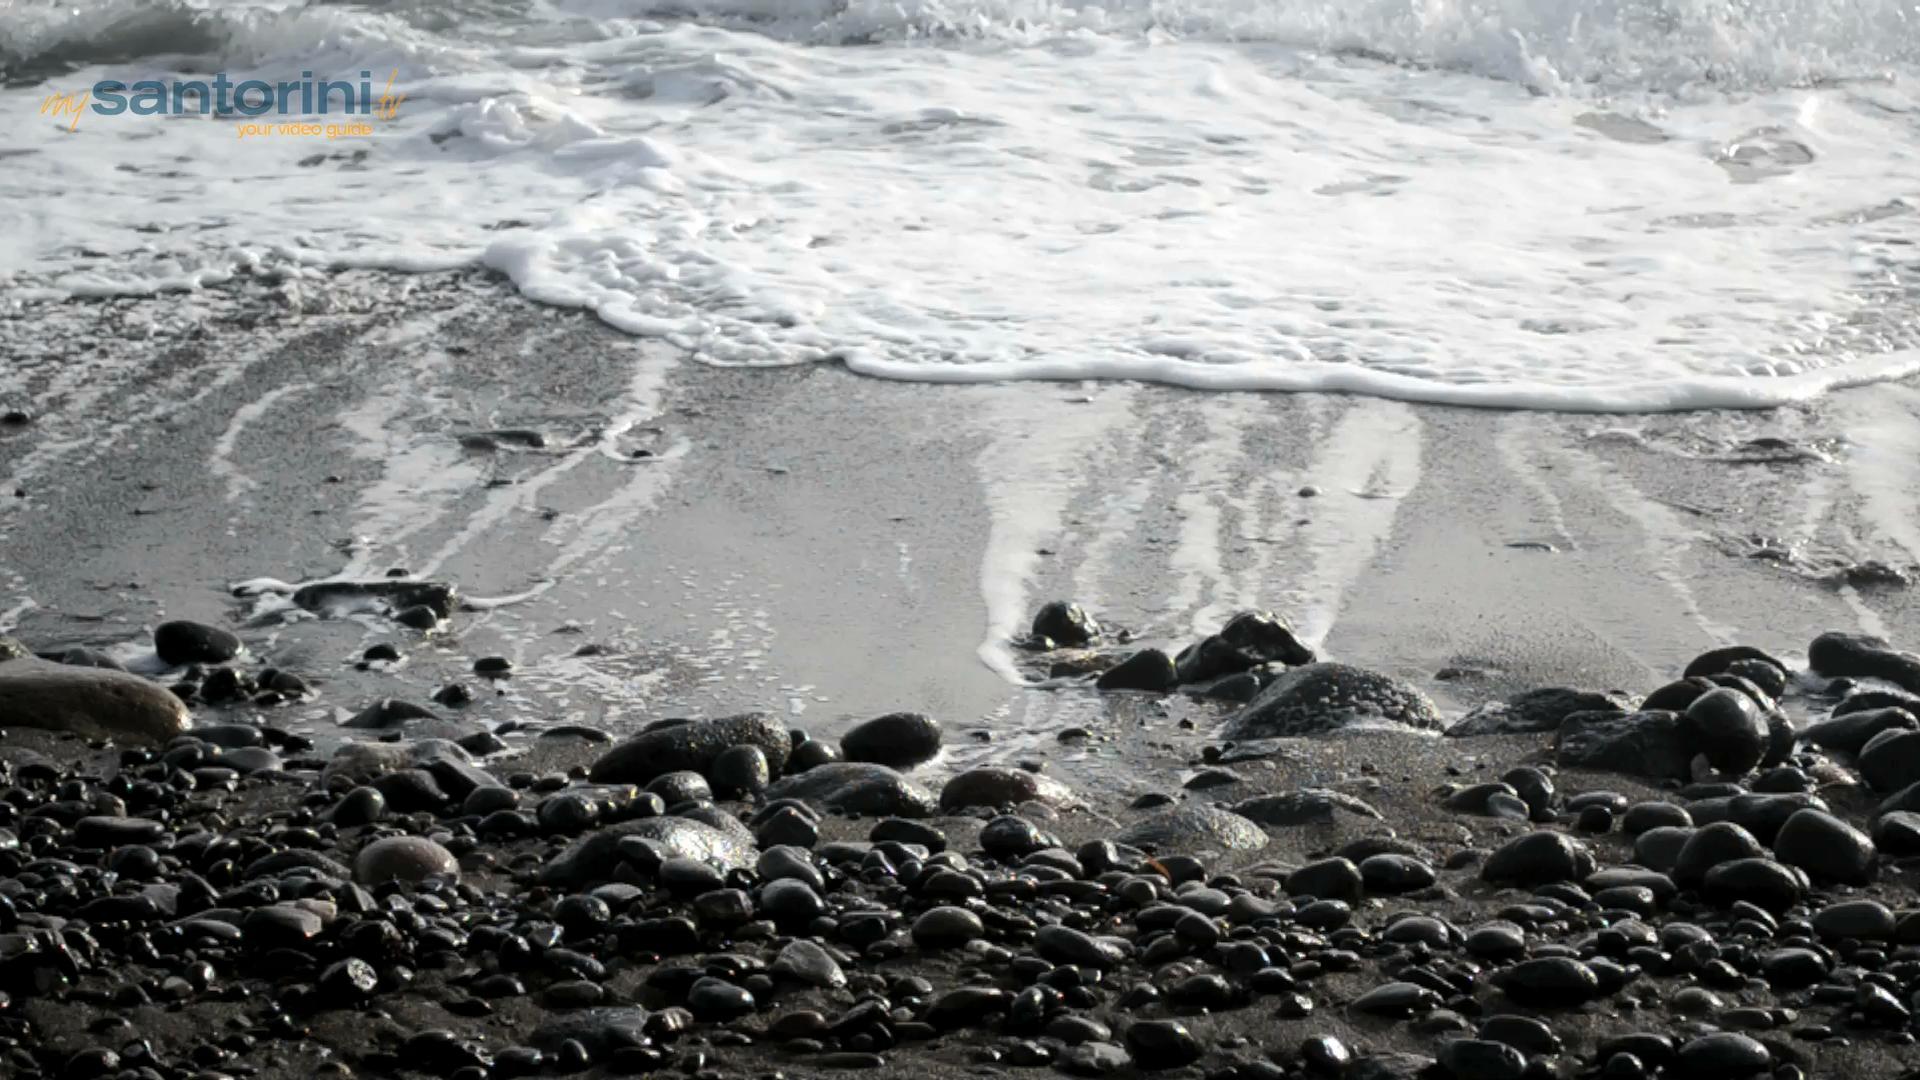 2 Unique Beaches of Santorini Island with lunar landscape